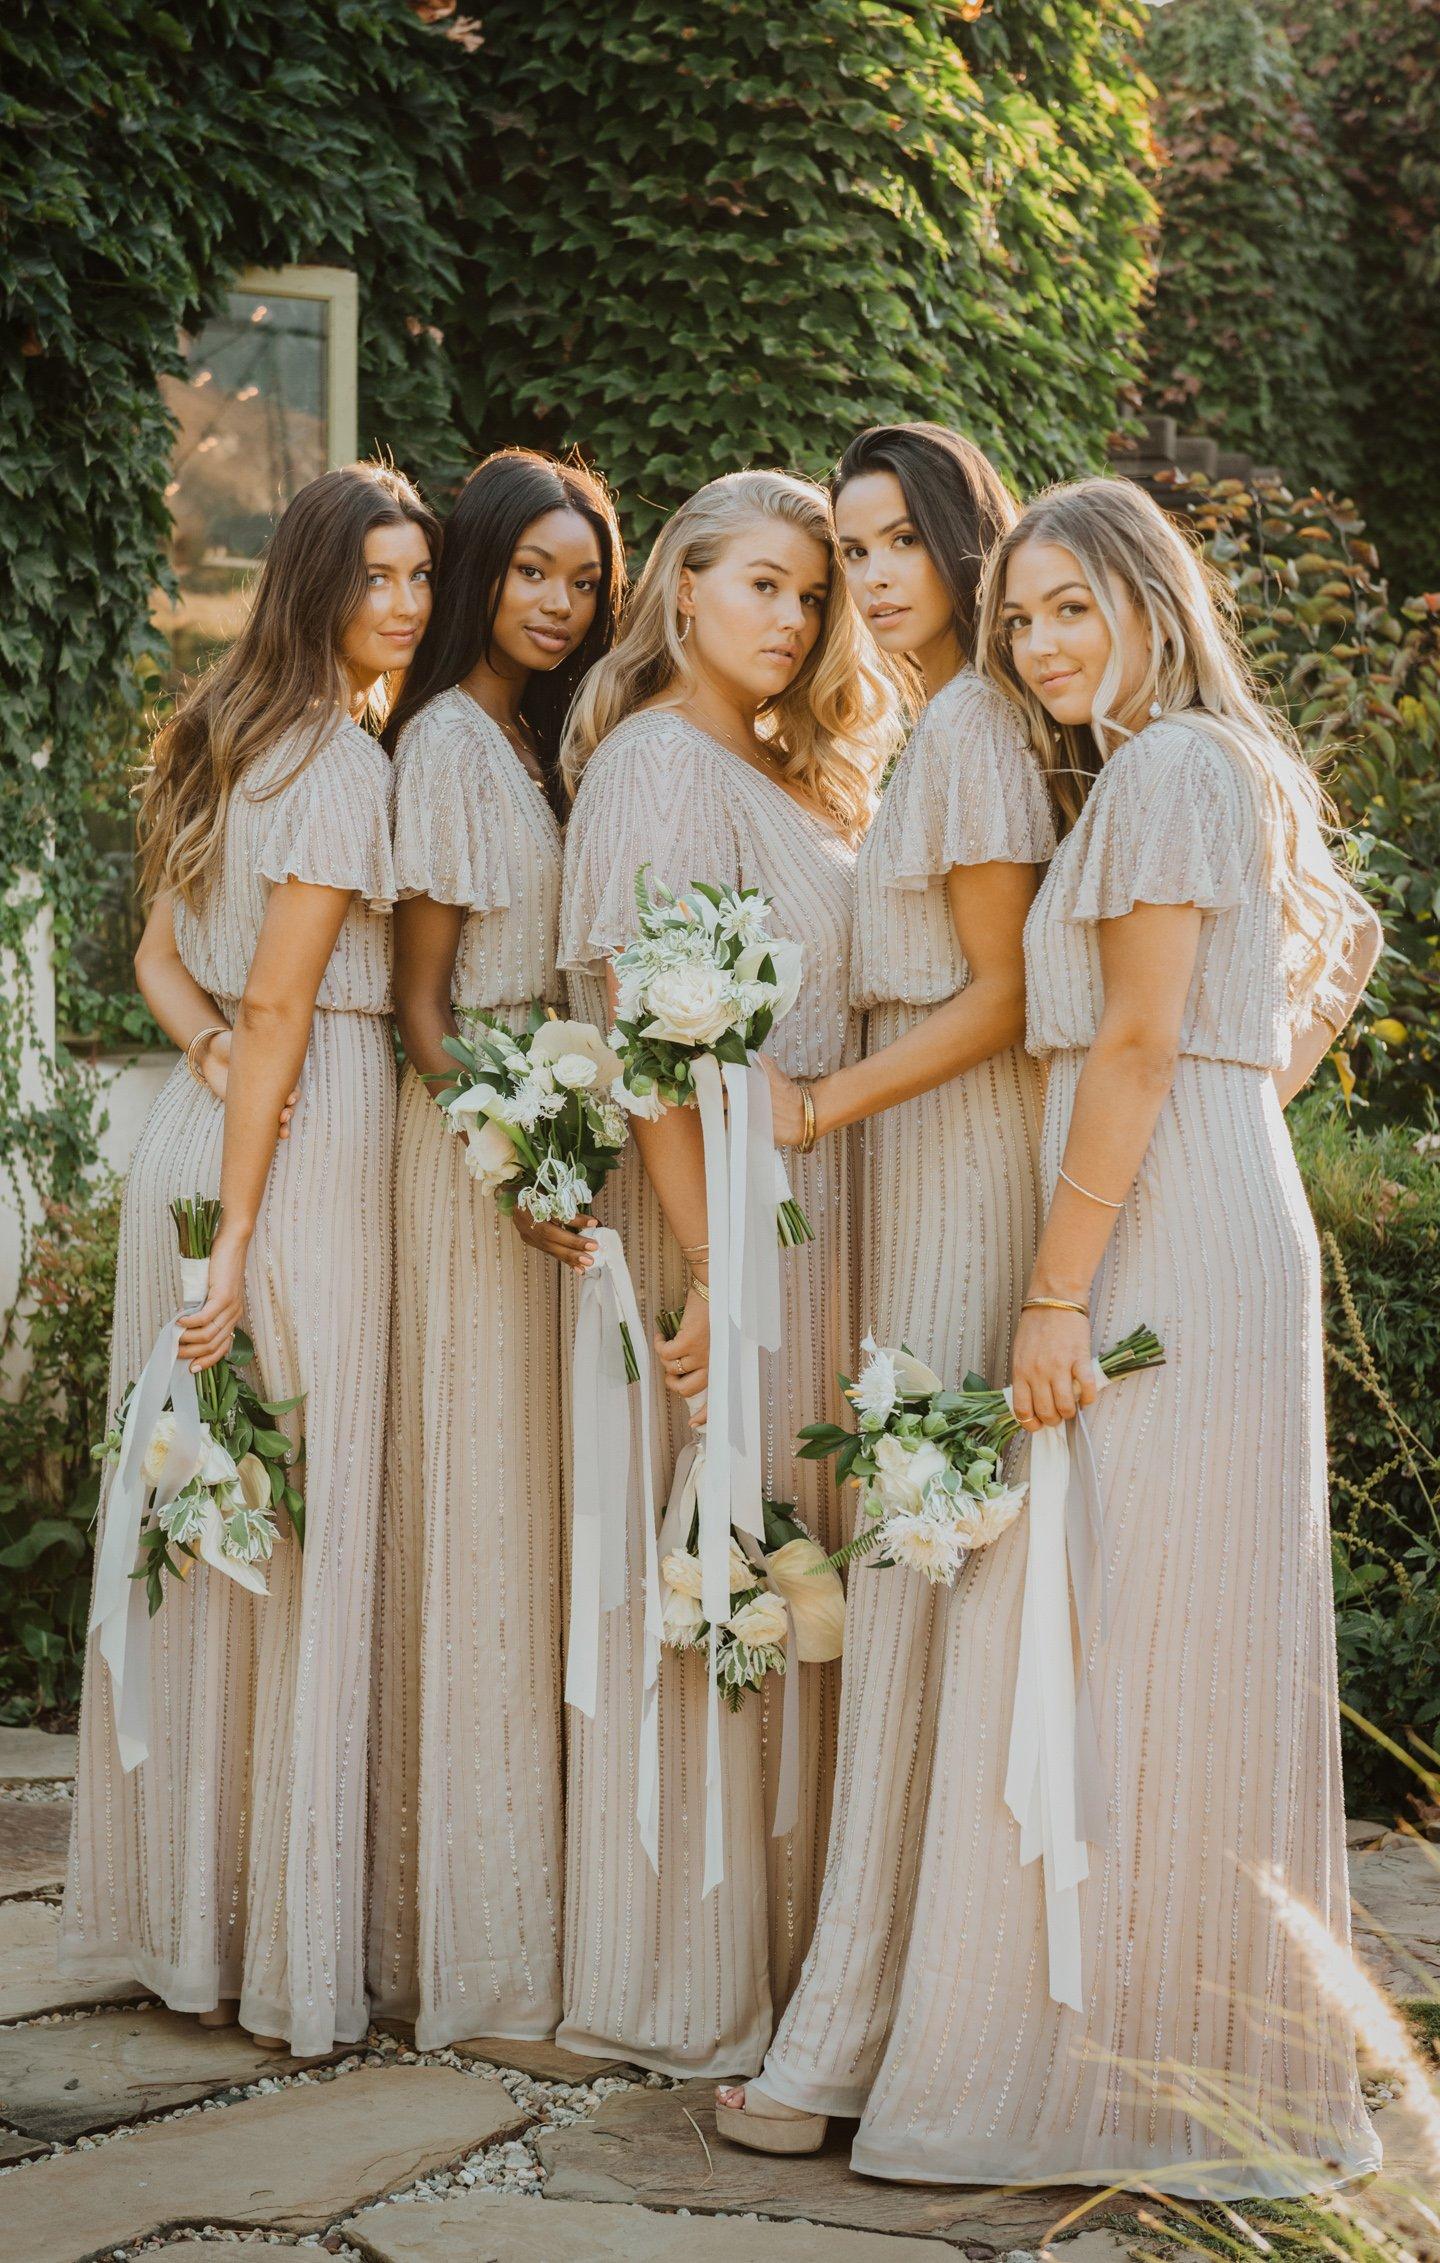 bridesmaid dresses, bridesmaid dress ideas, bridesmaid dress colors, bridesmaid dress styles, affordable bridesmaid dress, gold bridesmaid dress, beaded bridesmaid dress, sequin bridesmaid dress